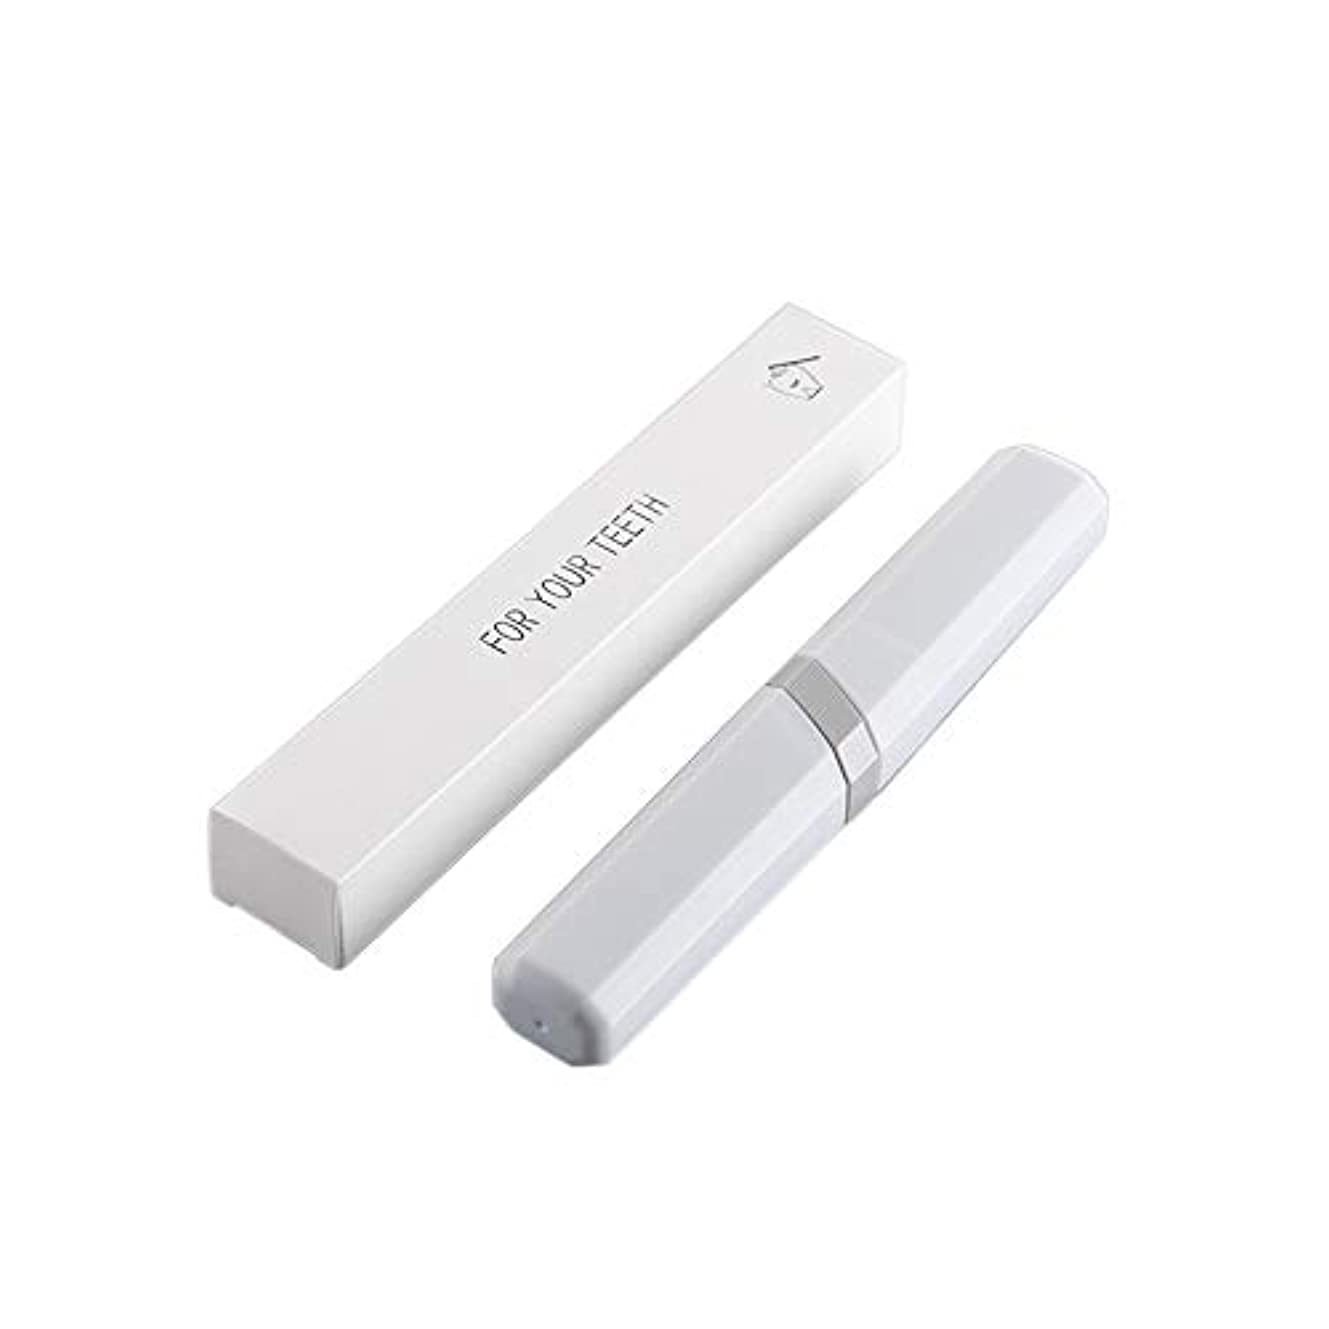 Decdeal 歯ブラシ ポータブル 収納ケース付き アウトドア旅行用